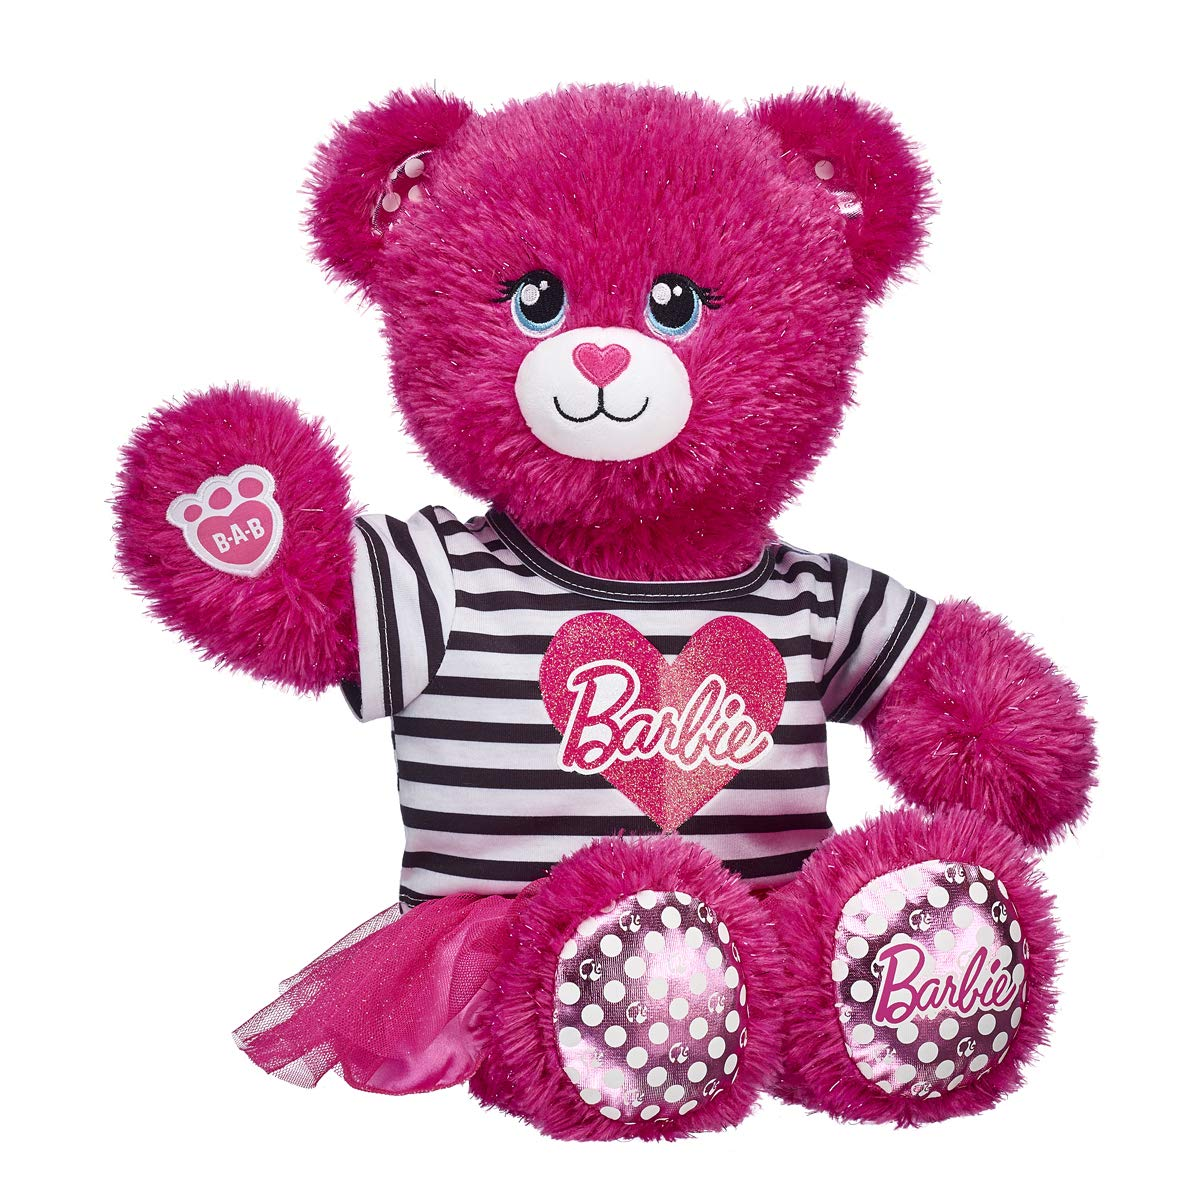 Build A Bear Workshop Barbie Bear Tutu Gift Set Build-a-Bear Stuffed  Animals & Plush Toys Toys & Games kiririgardenhotel.com